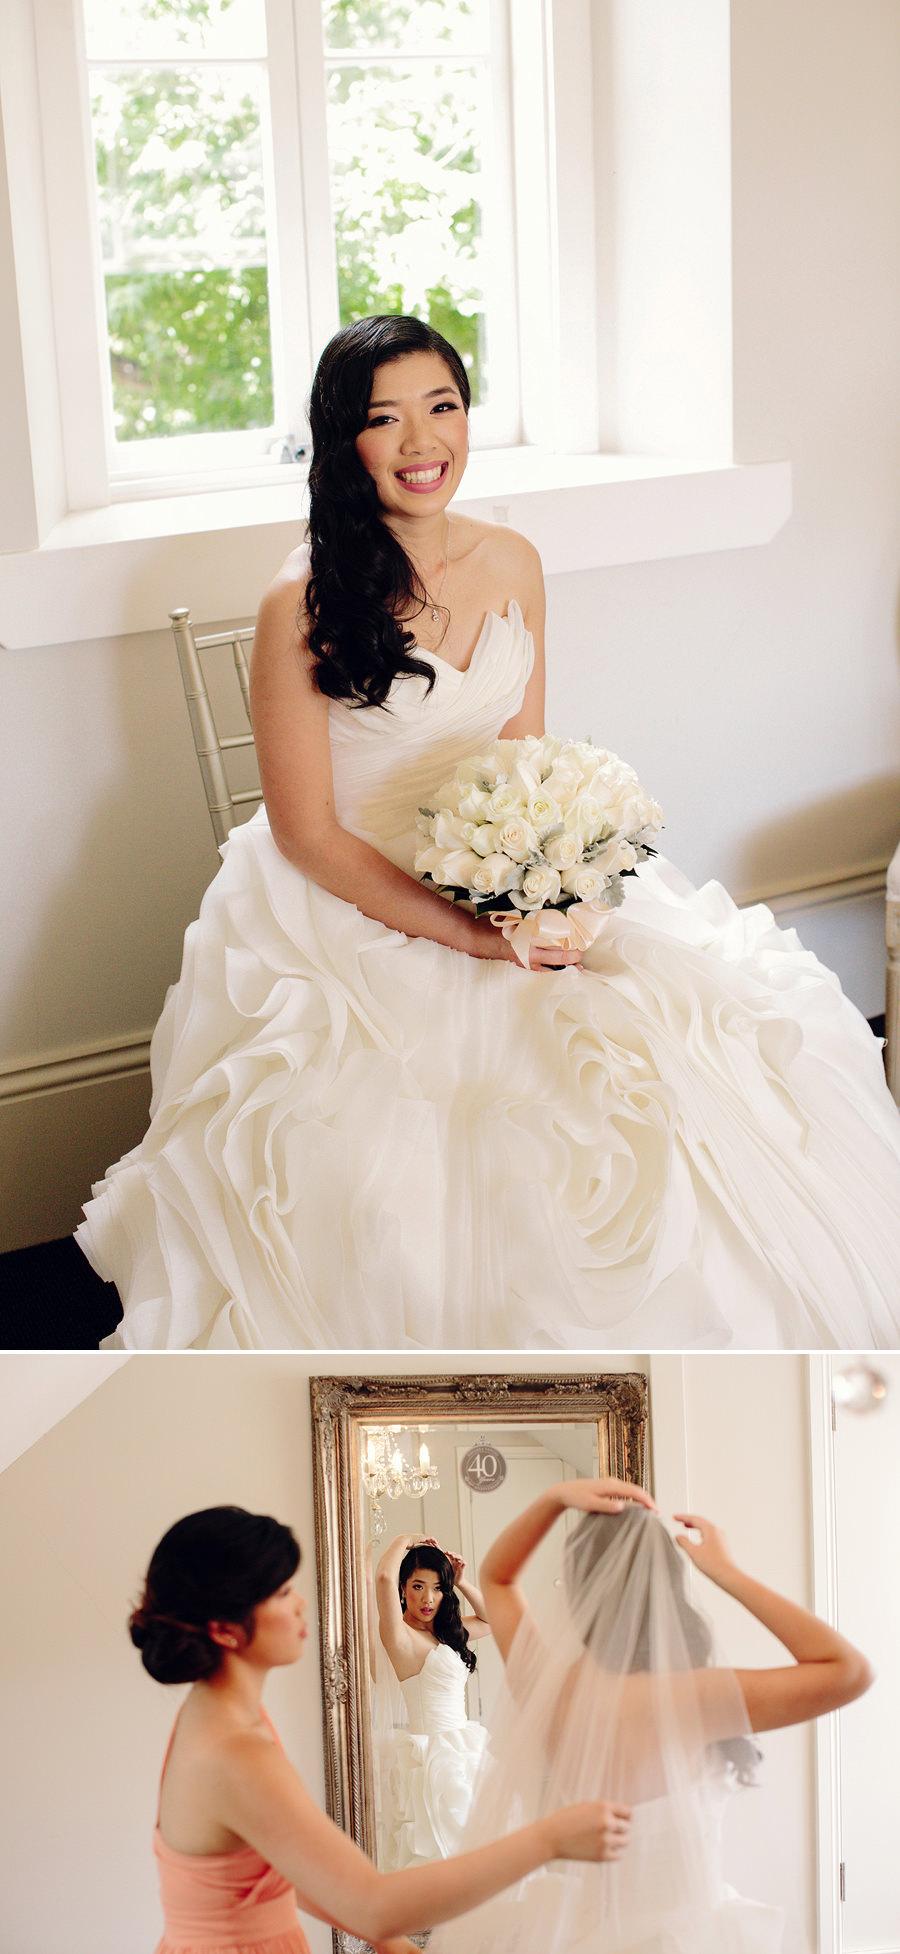 Navarra Venues Wedding Photographer: Bridal suite